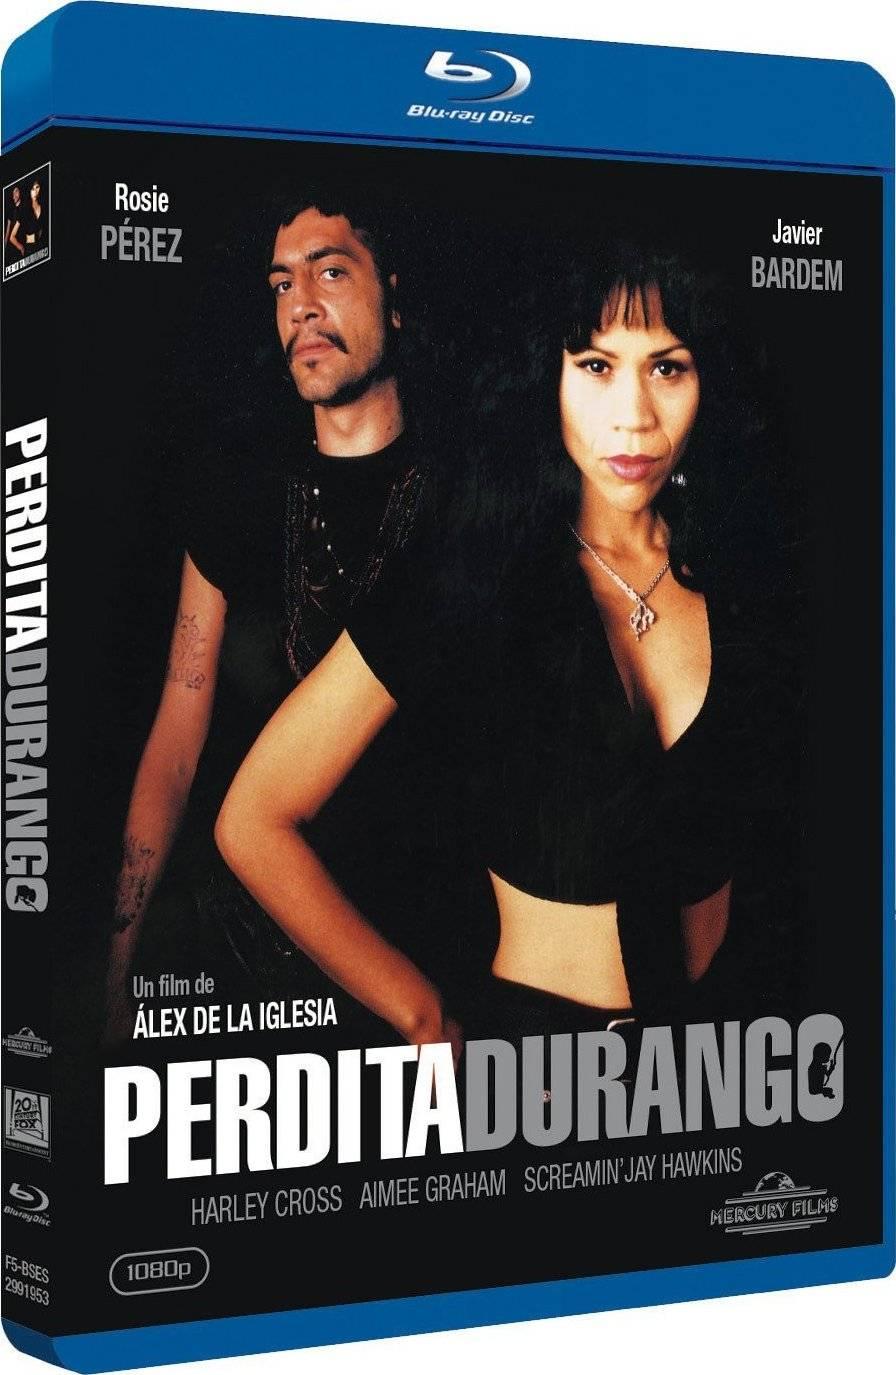 Dance with the Devil (1997) Perdita Durango